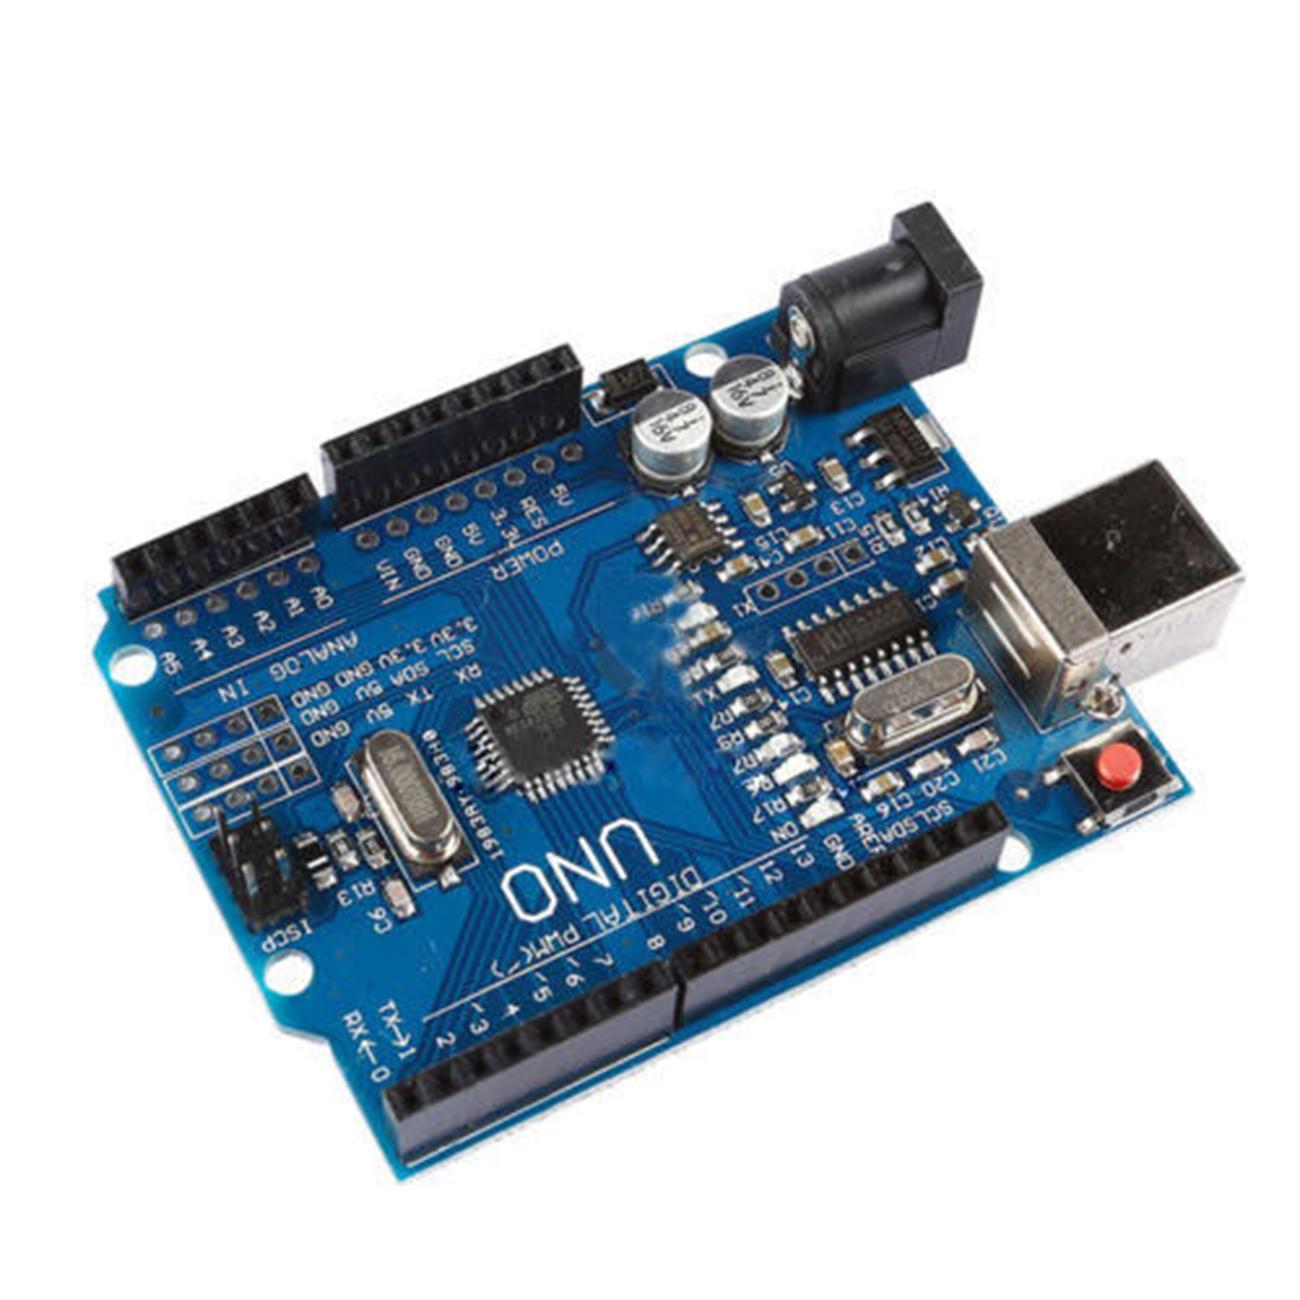 SYDNEY COMBINED Postage New Arduino Compatible UNO R3 ATMega328P+ATMega16U2